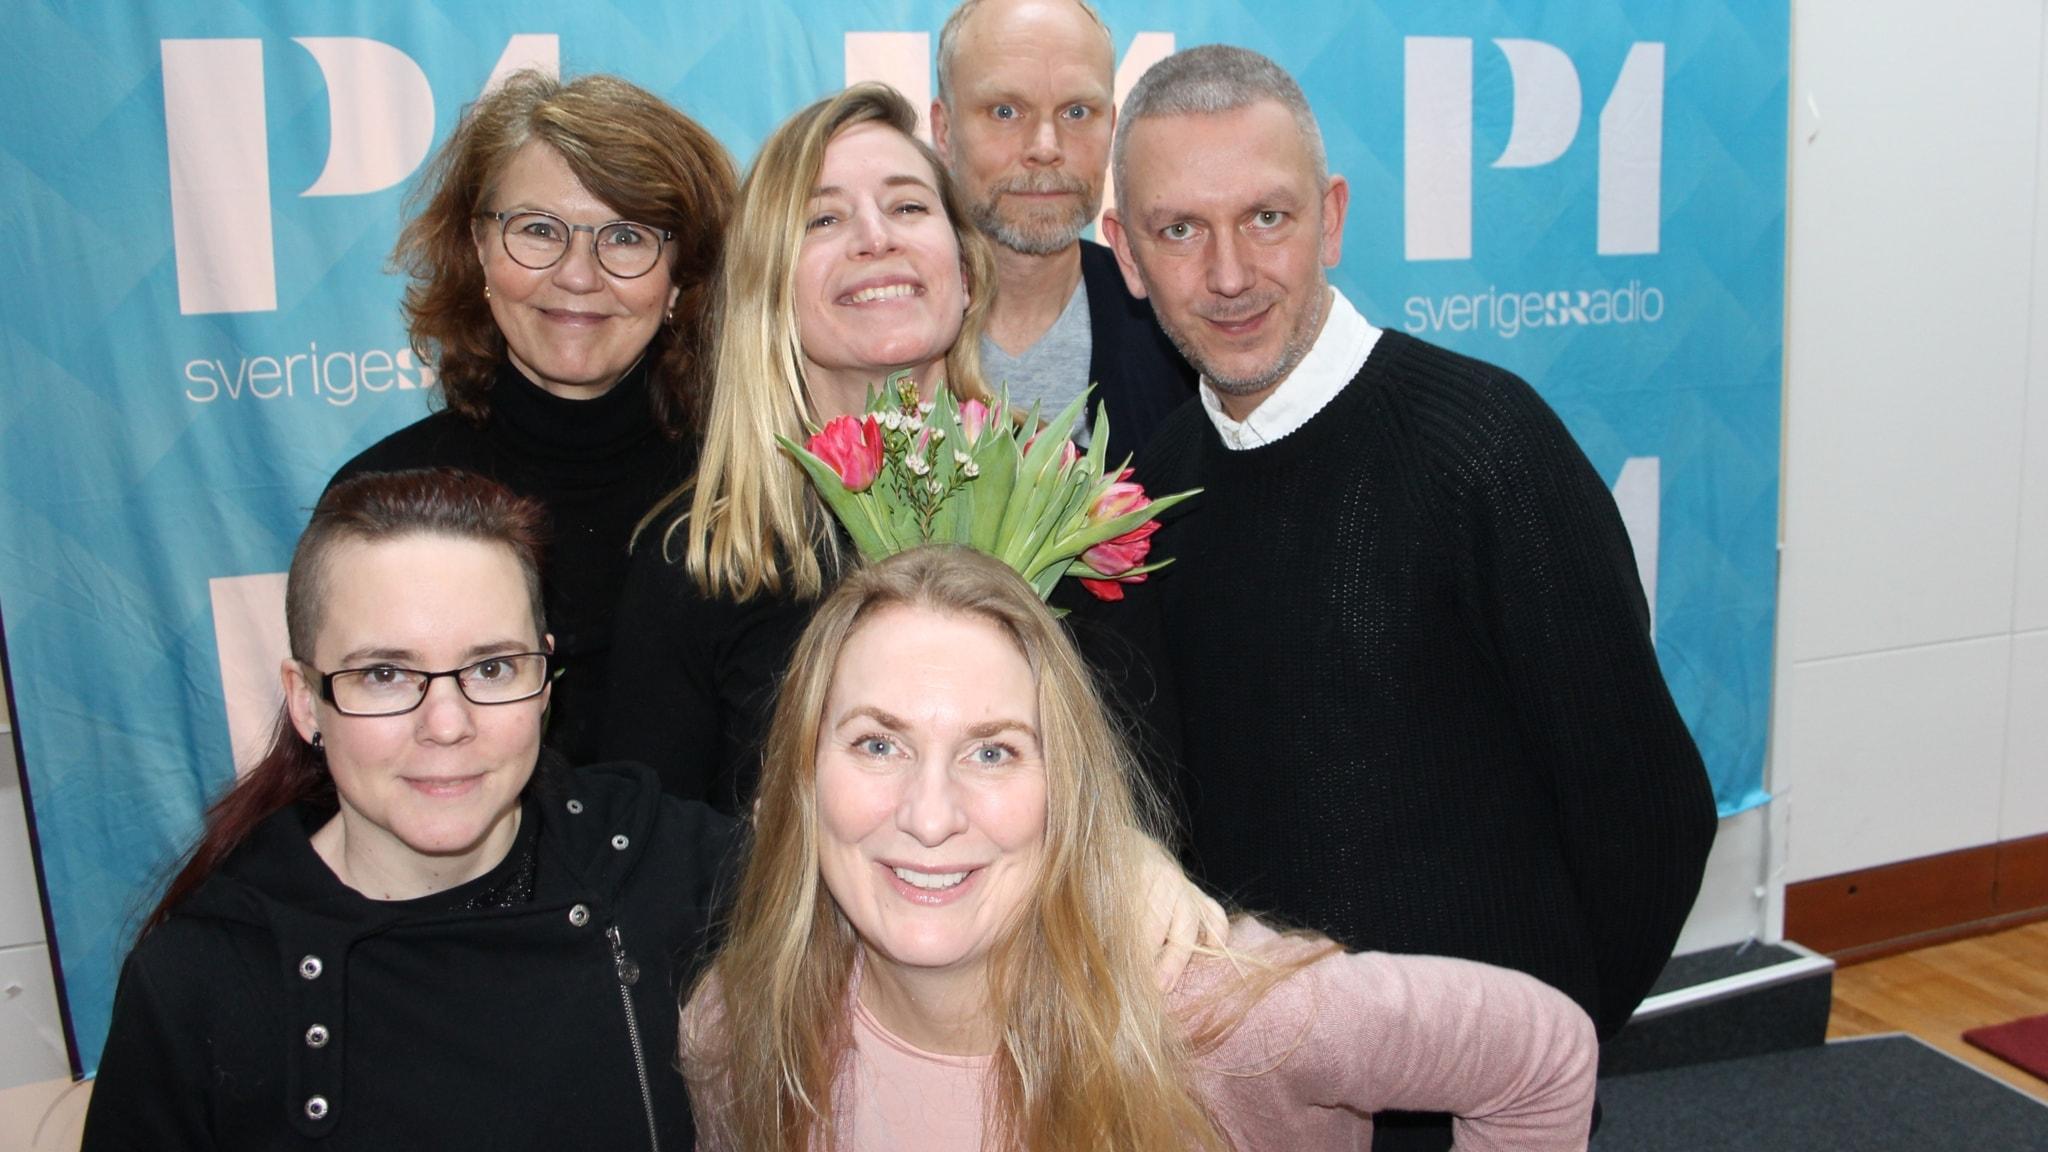 Kristian Luuk, Andres Lokko, Heidi Avellan och Karin Pettersson!